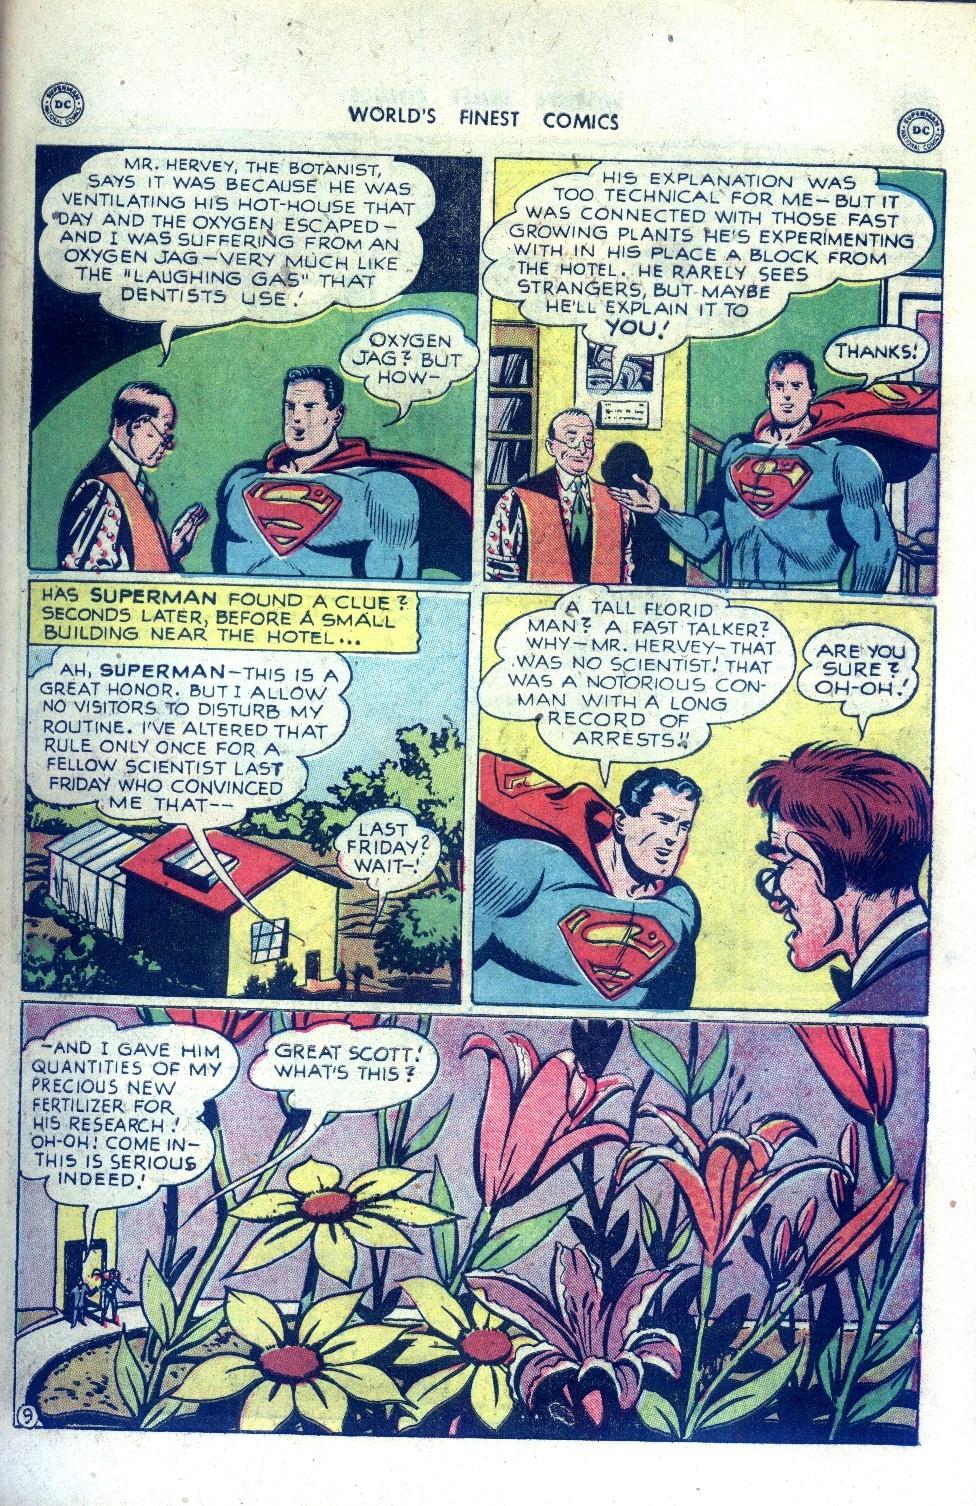 Read online World's Finest Comics comic -  Issue #43 - 11